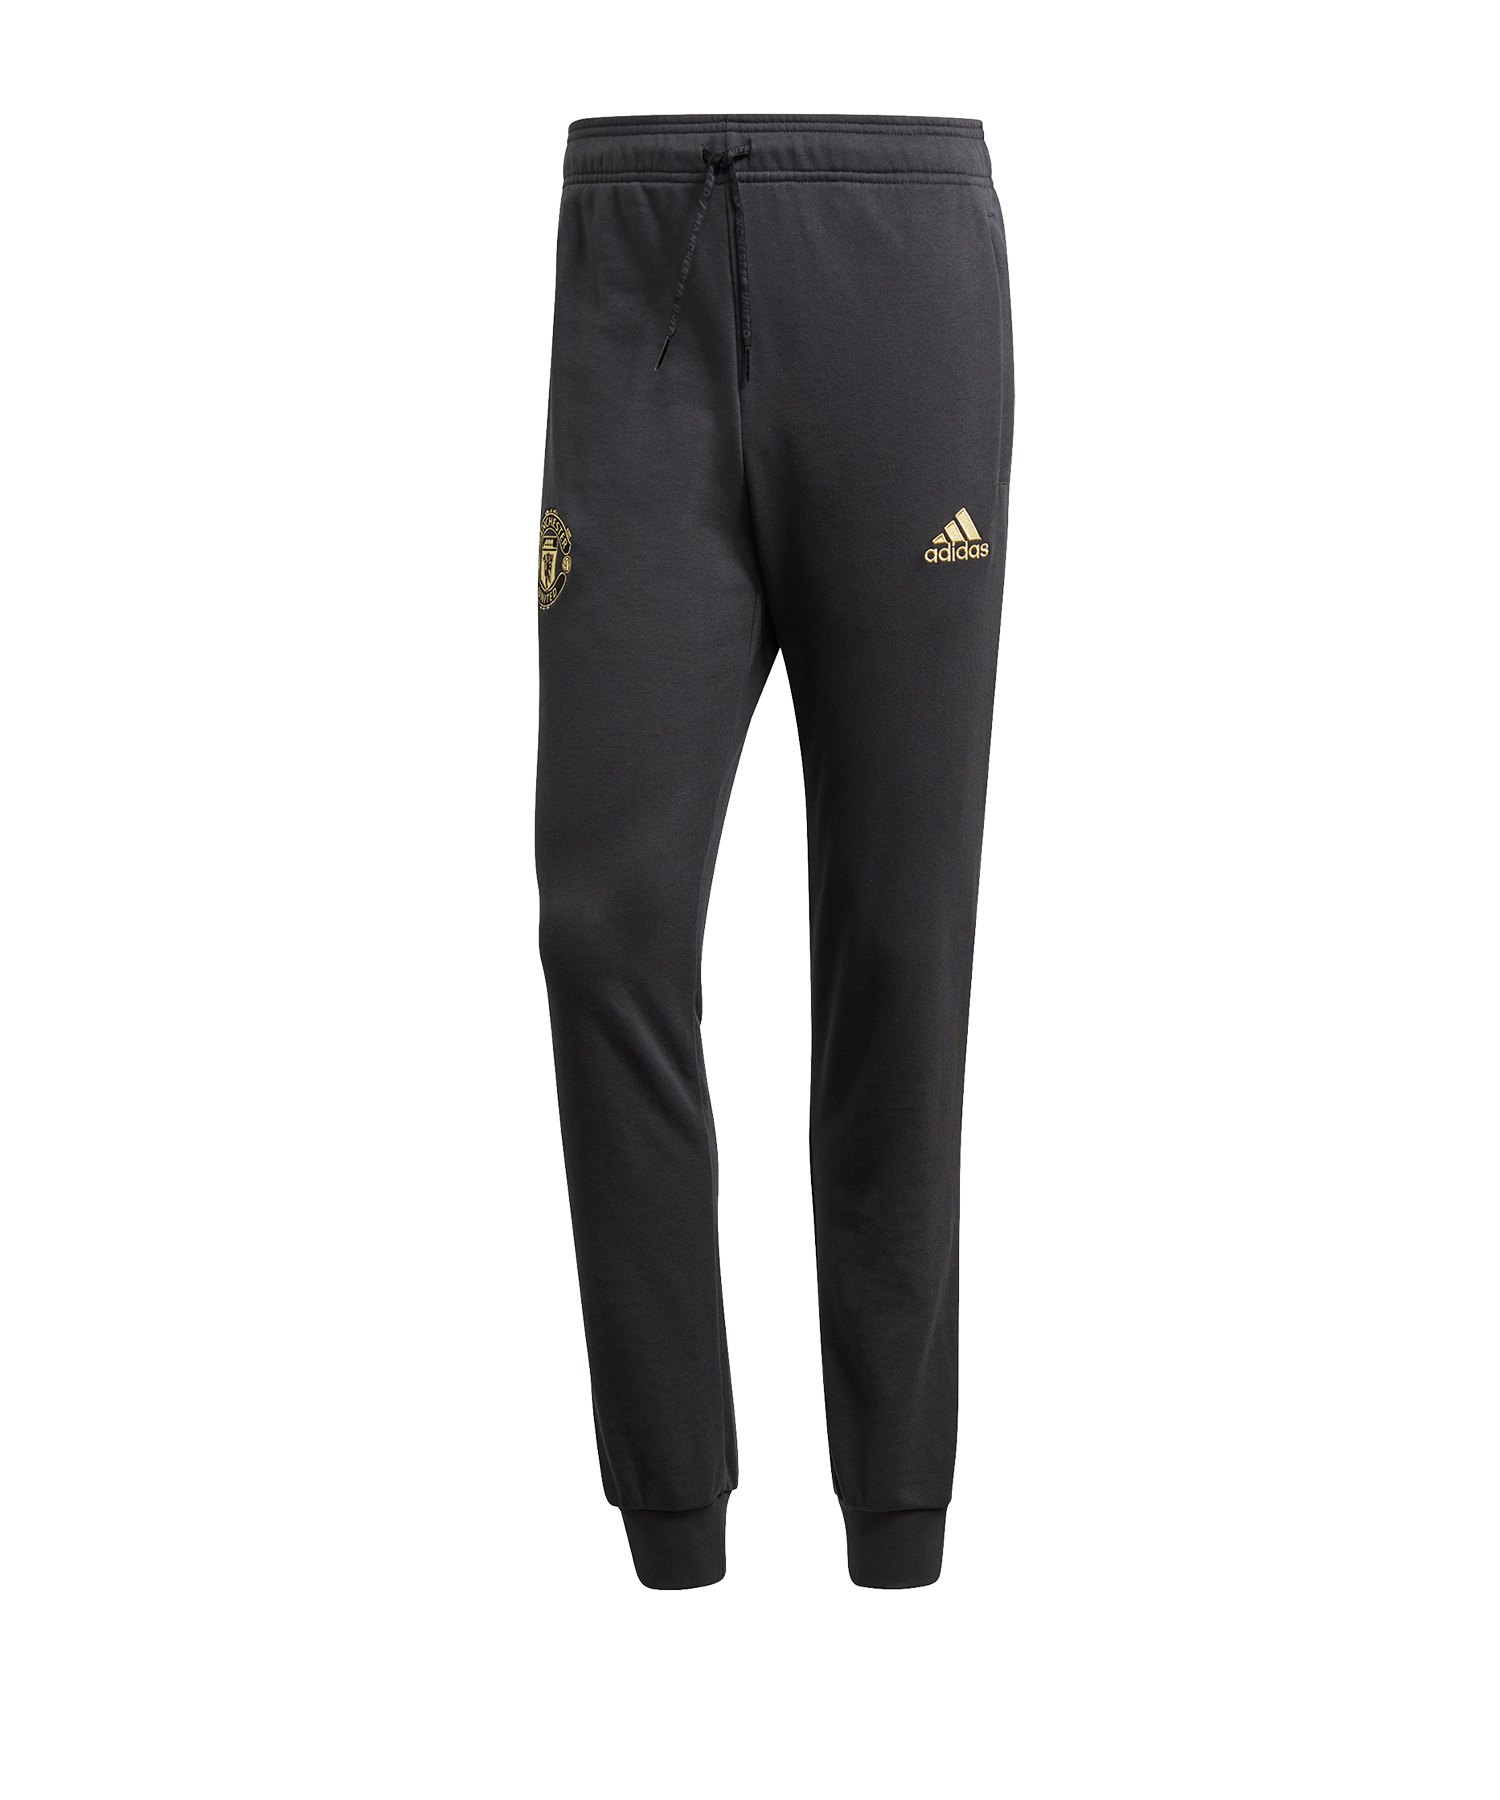 adidas Manchester United CNY Jogginghose Schwarz - grau